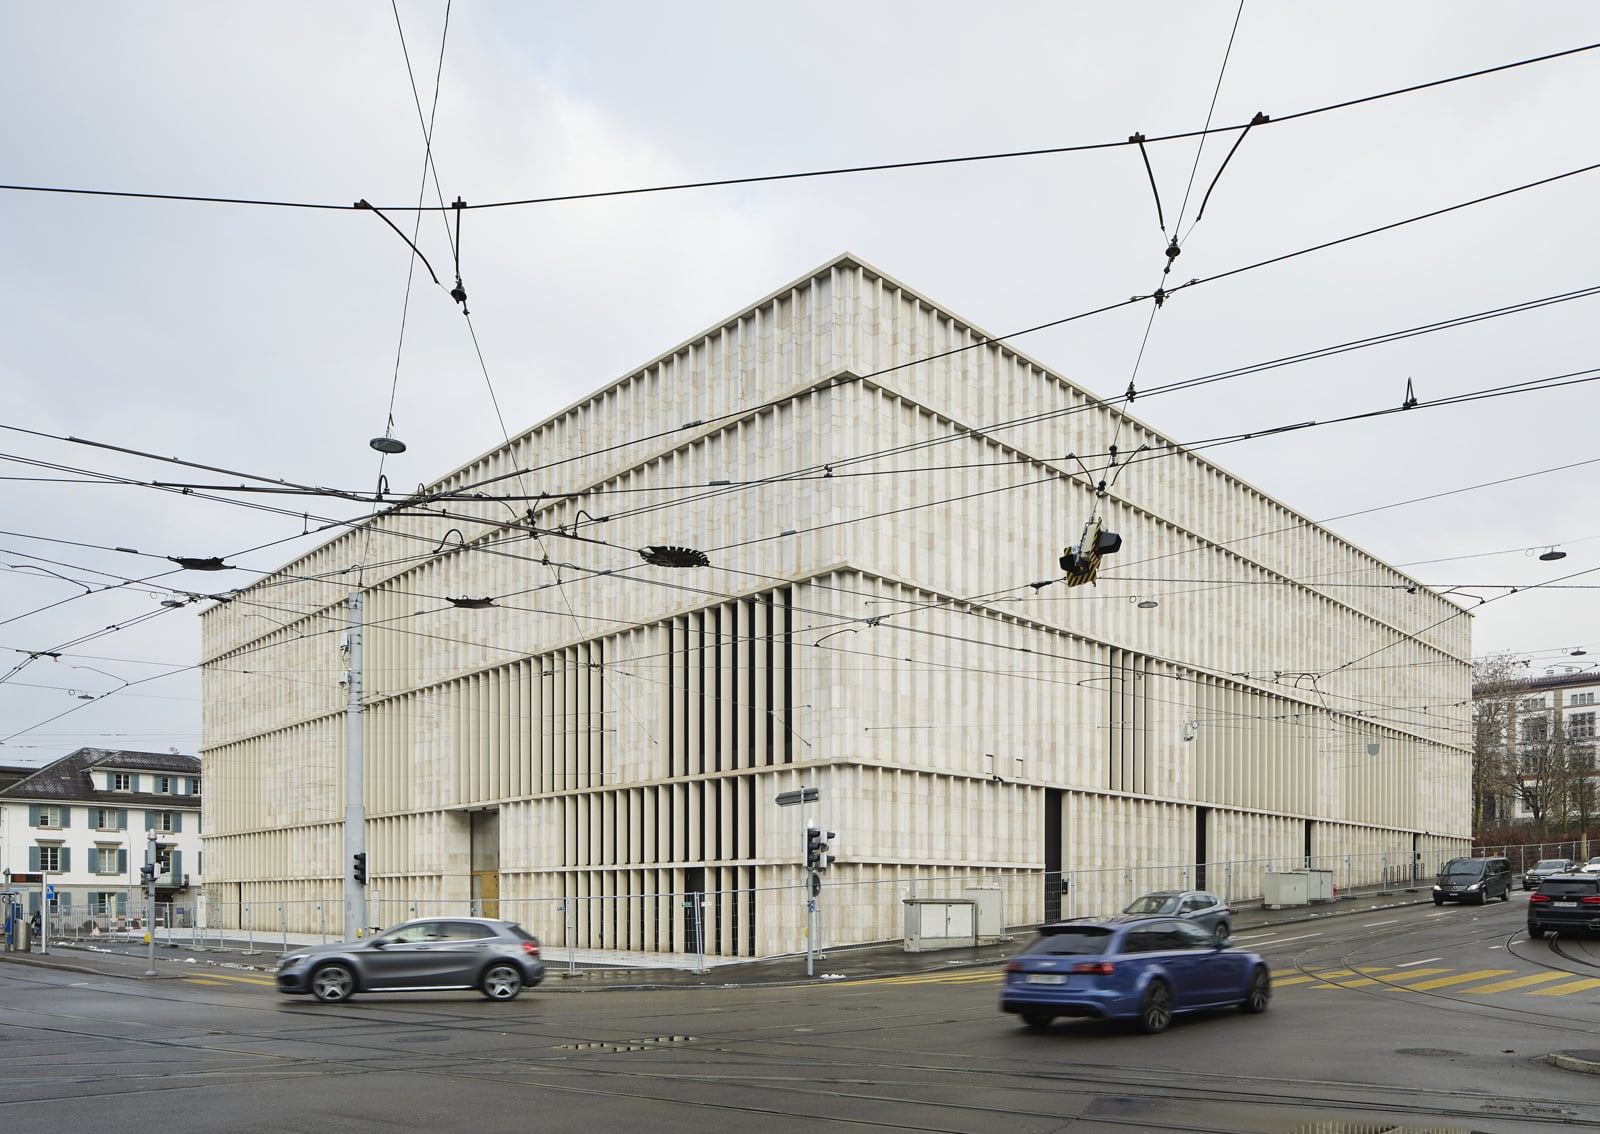 Kunsthaus Zürich  - 20210712 Chipperfield Kunsthaus 02 33